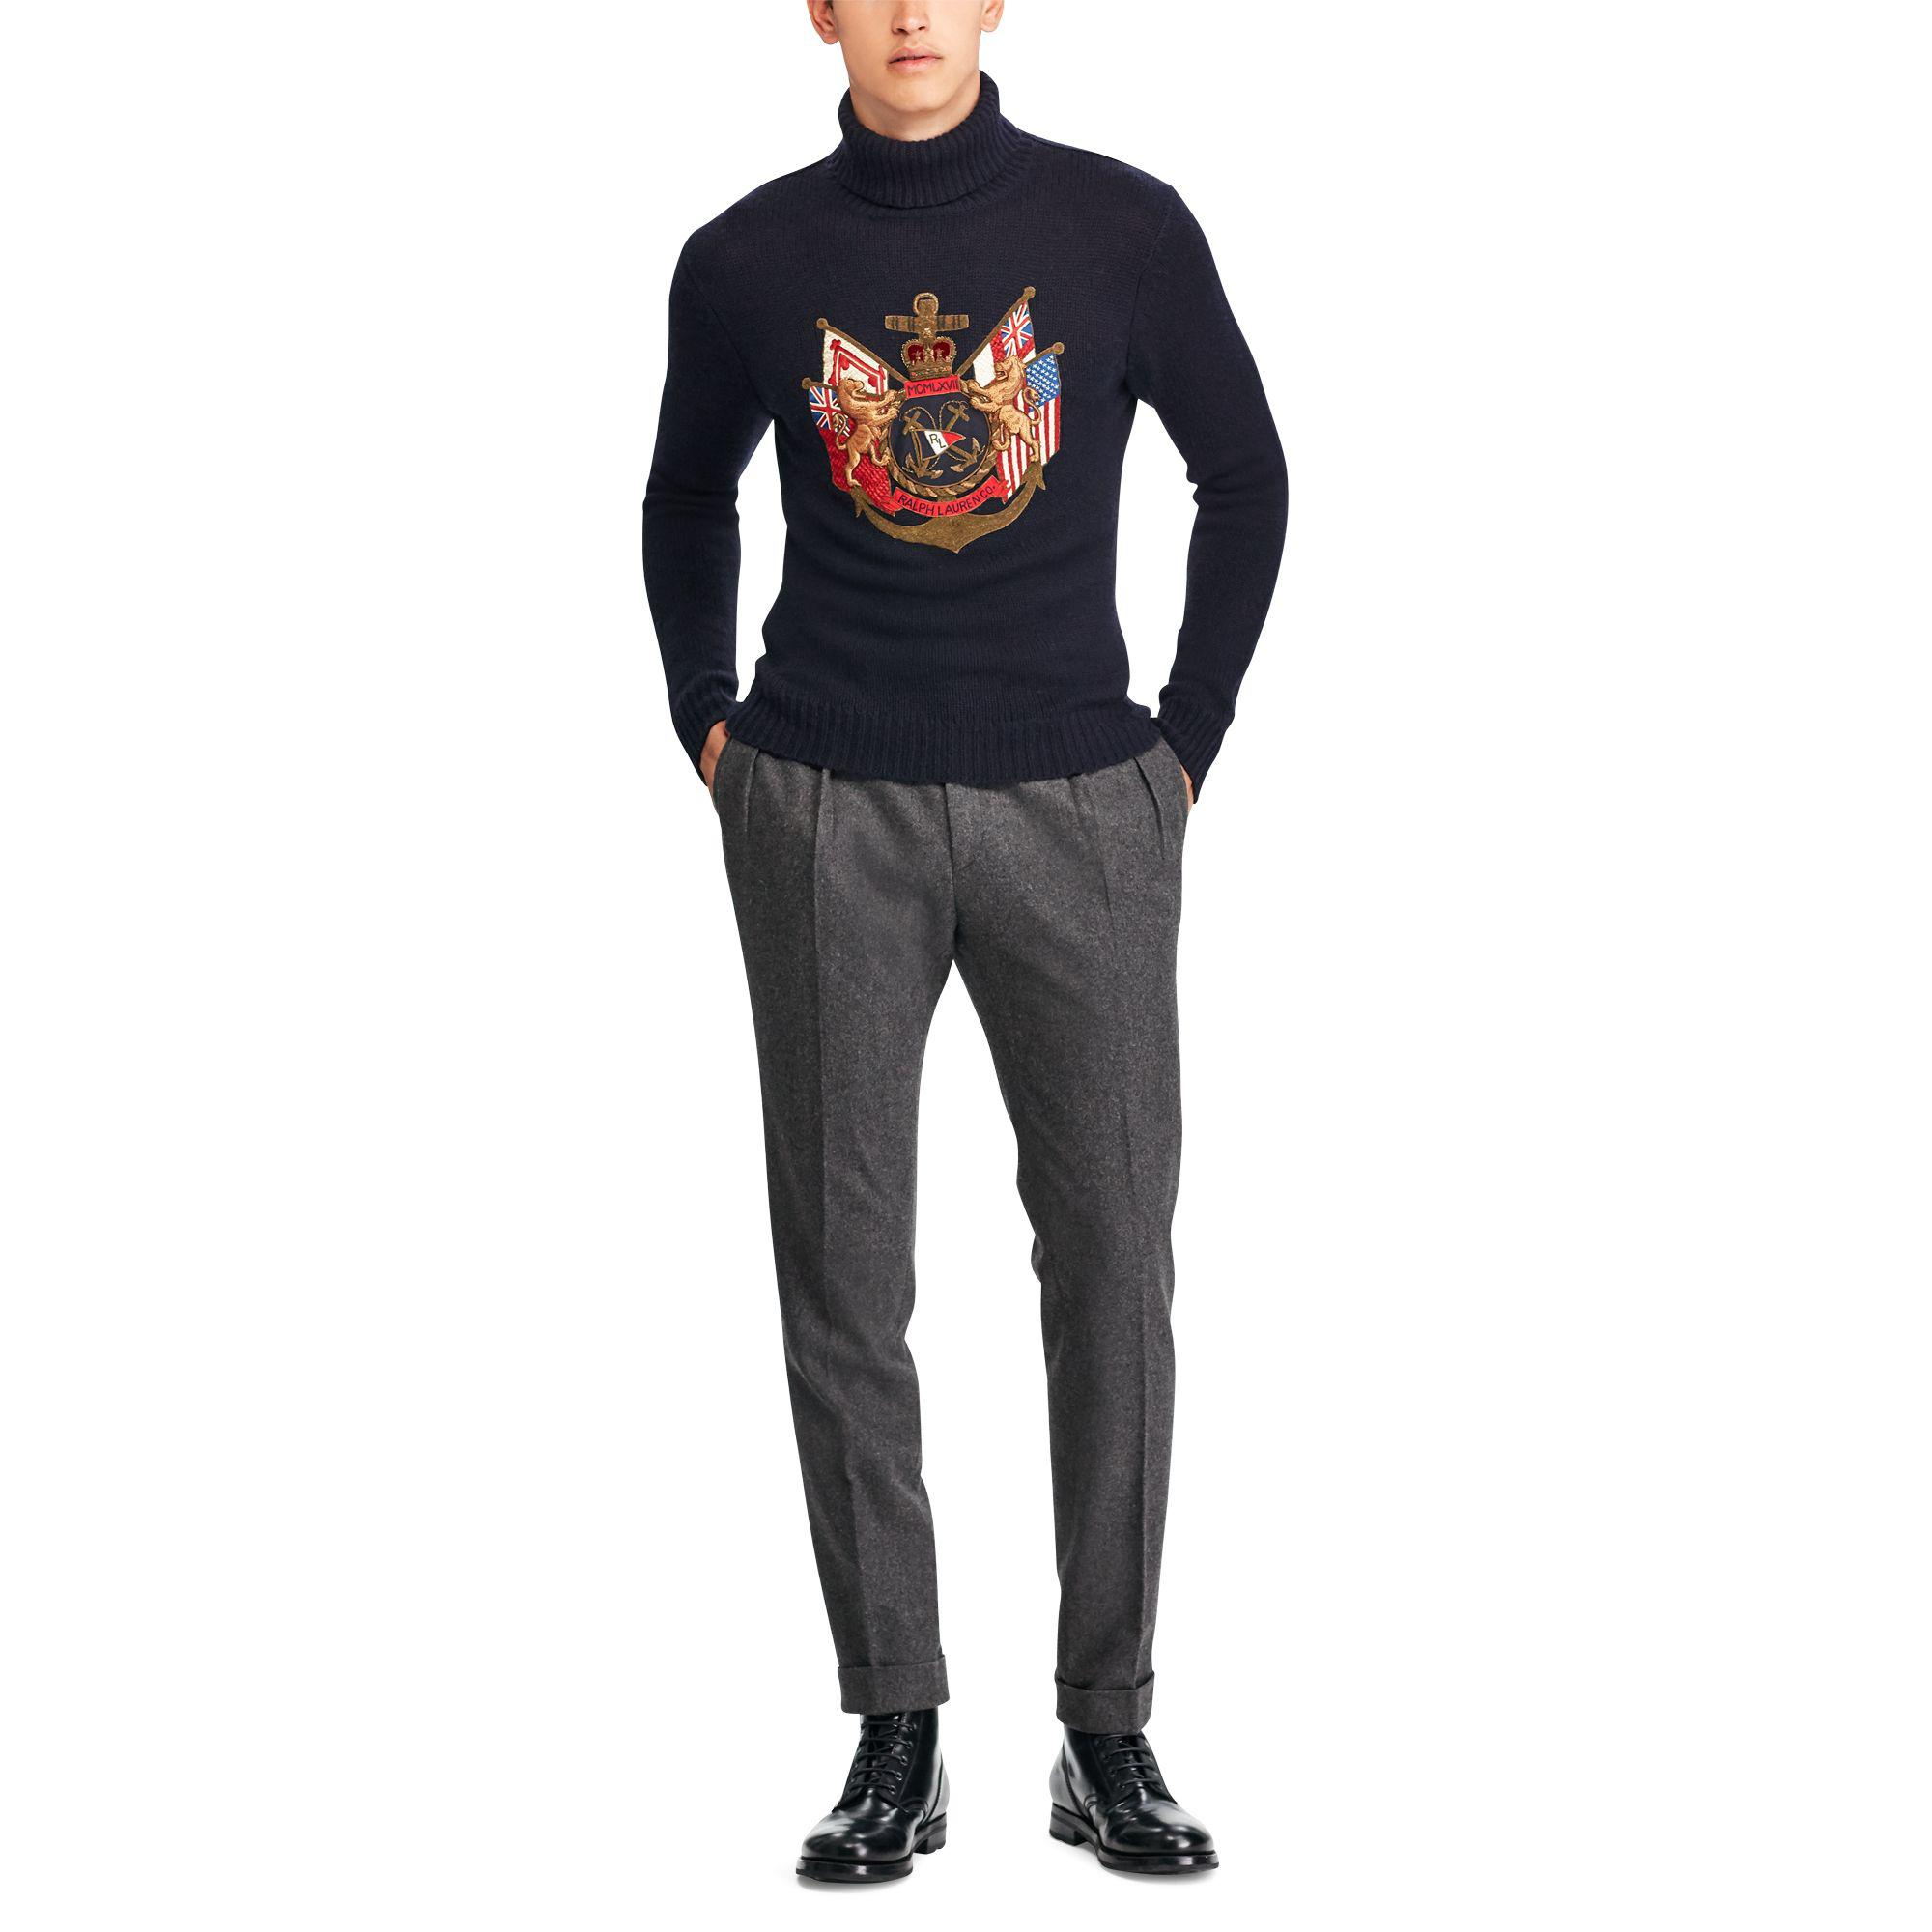 d6effa61a407 Lyst - Ralph Lauren Purple Label Bullion-patch Cashmere Sweater in ...